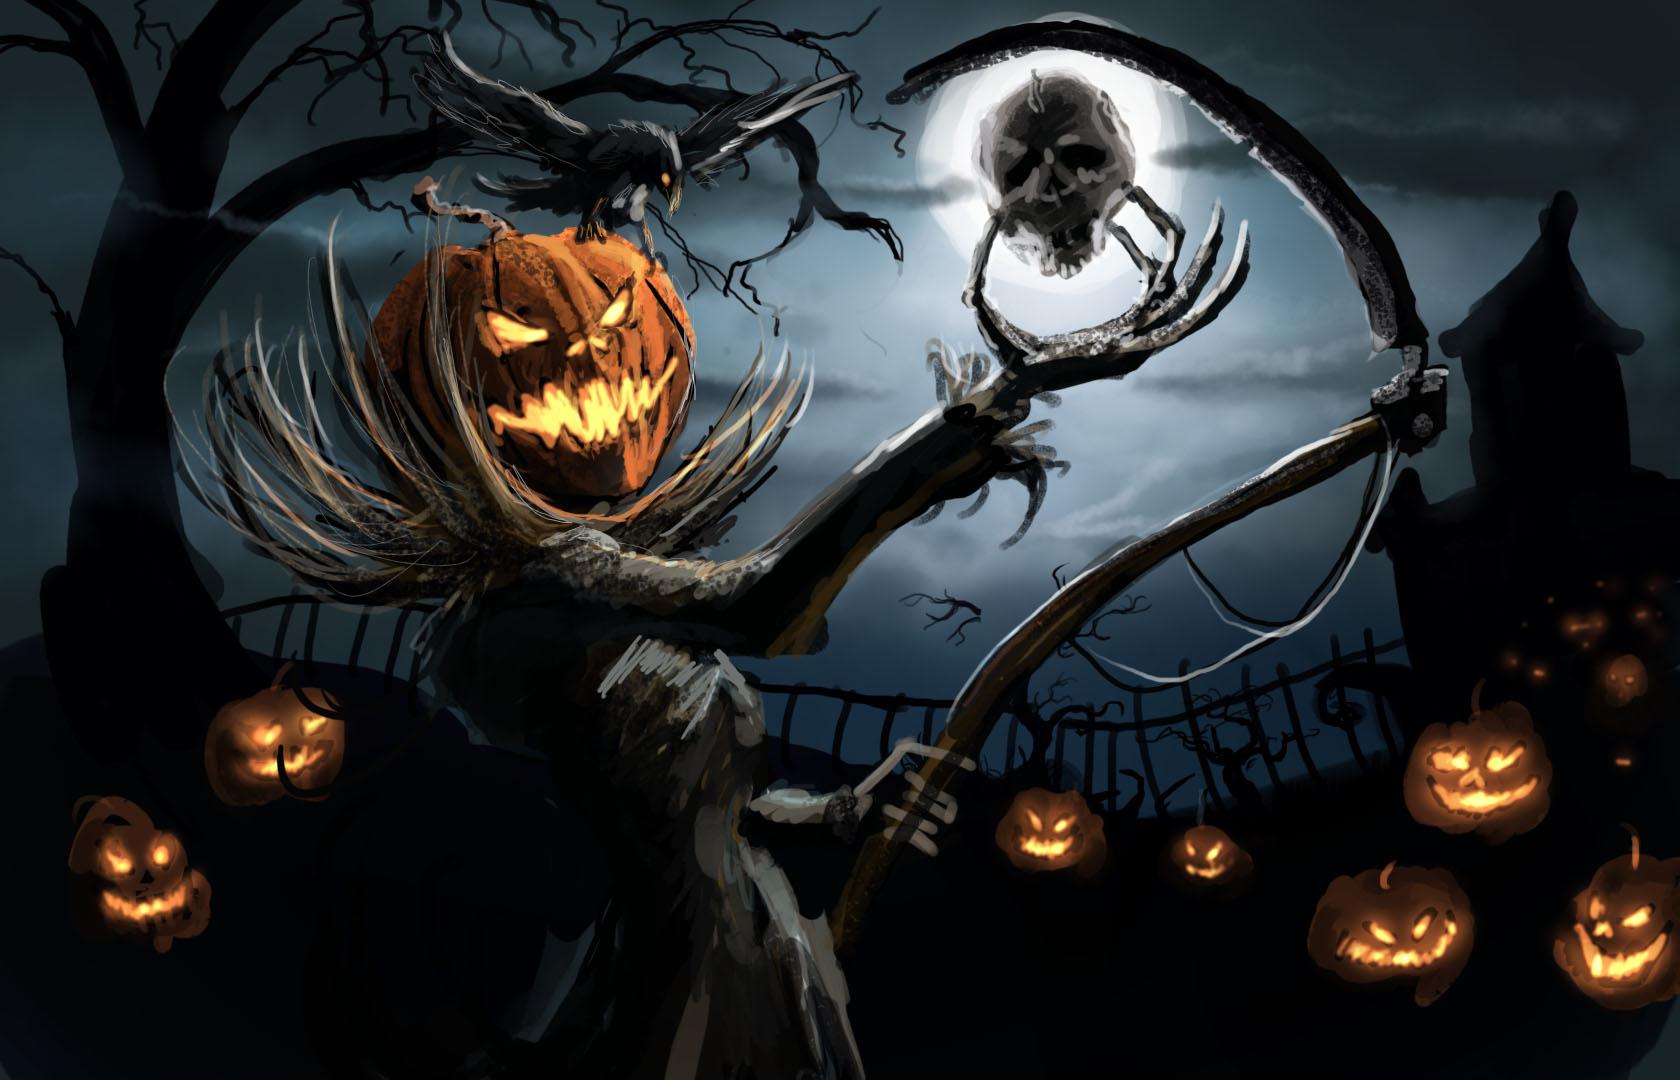 72 Scary Happy Halloween Wallpaper On Wallpapersafari